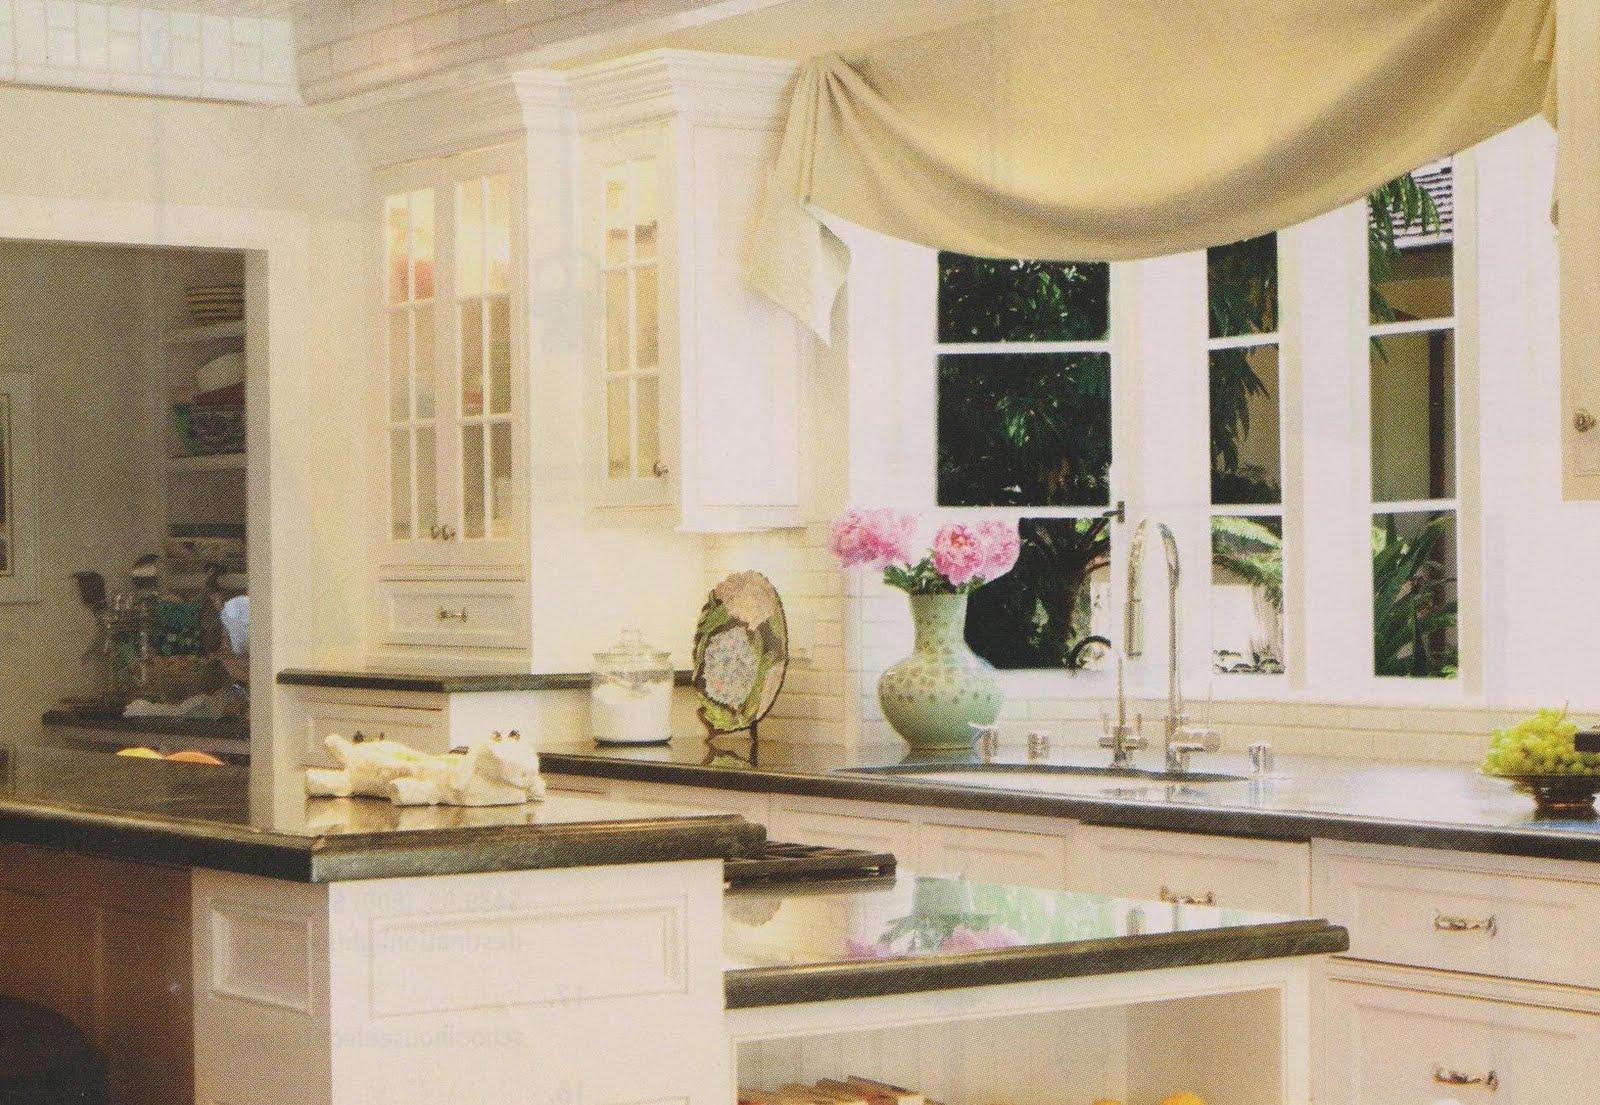 Fabulous Luxury Kitchen and Bath Designs 1600 x 1105 · 372 kB · jpeg